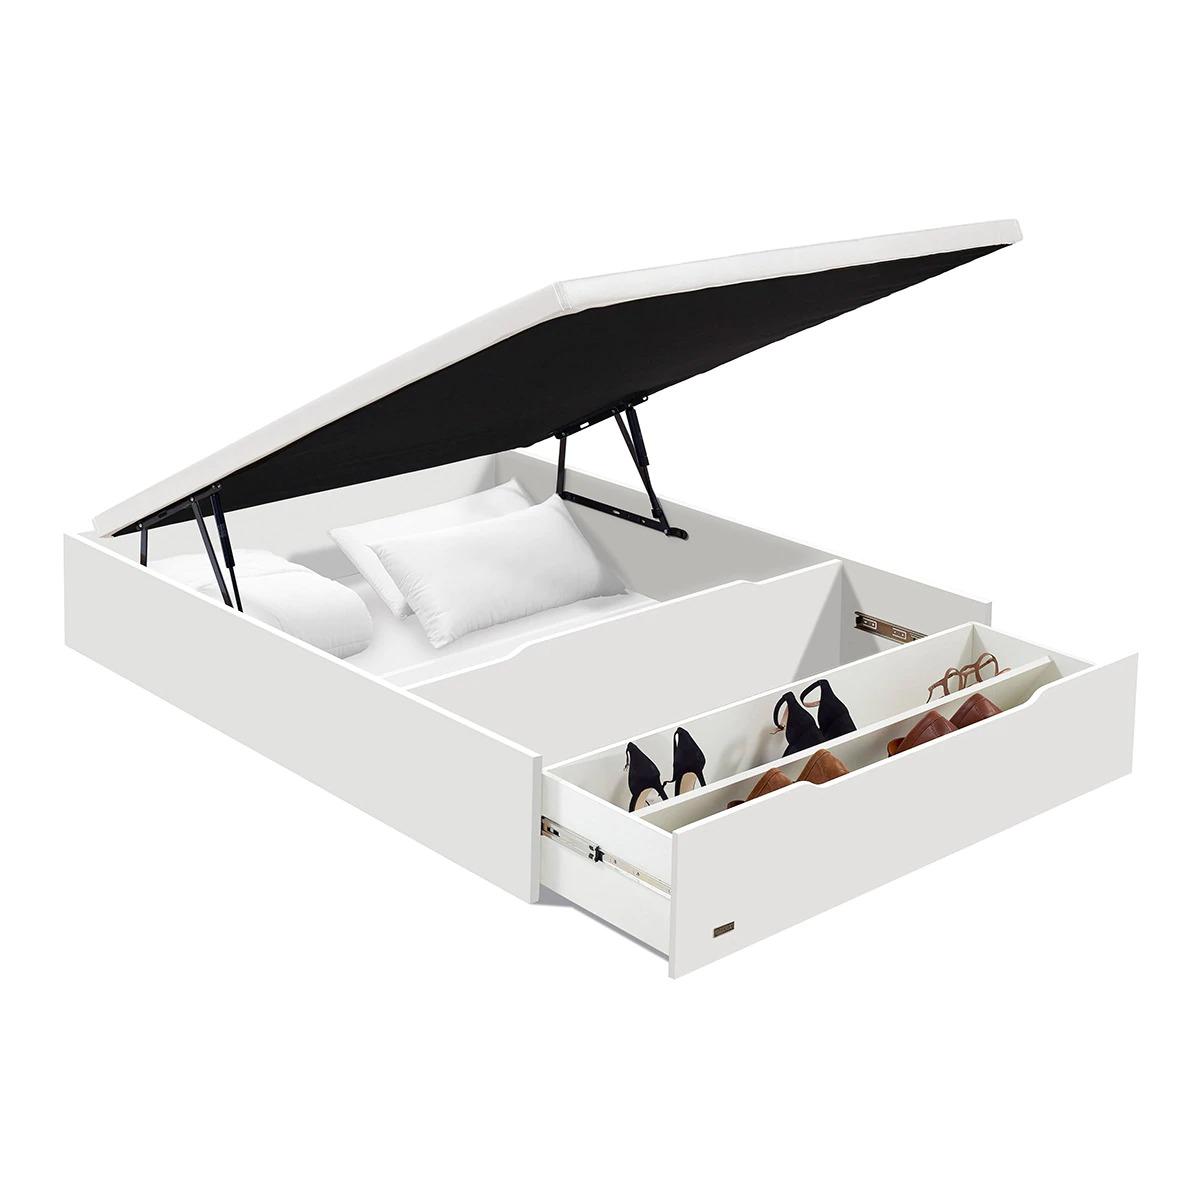 FLEX Folding sofa with Flex shoe rack